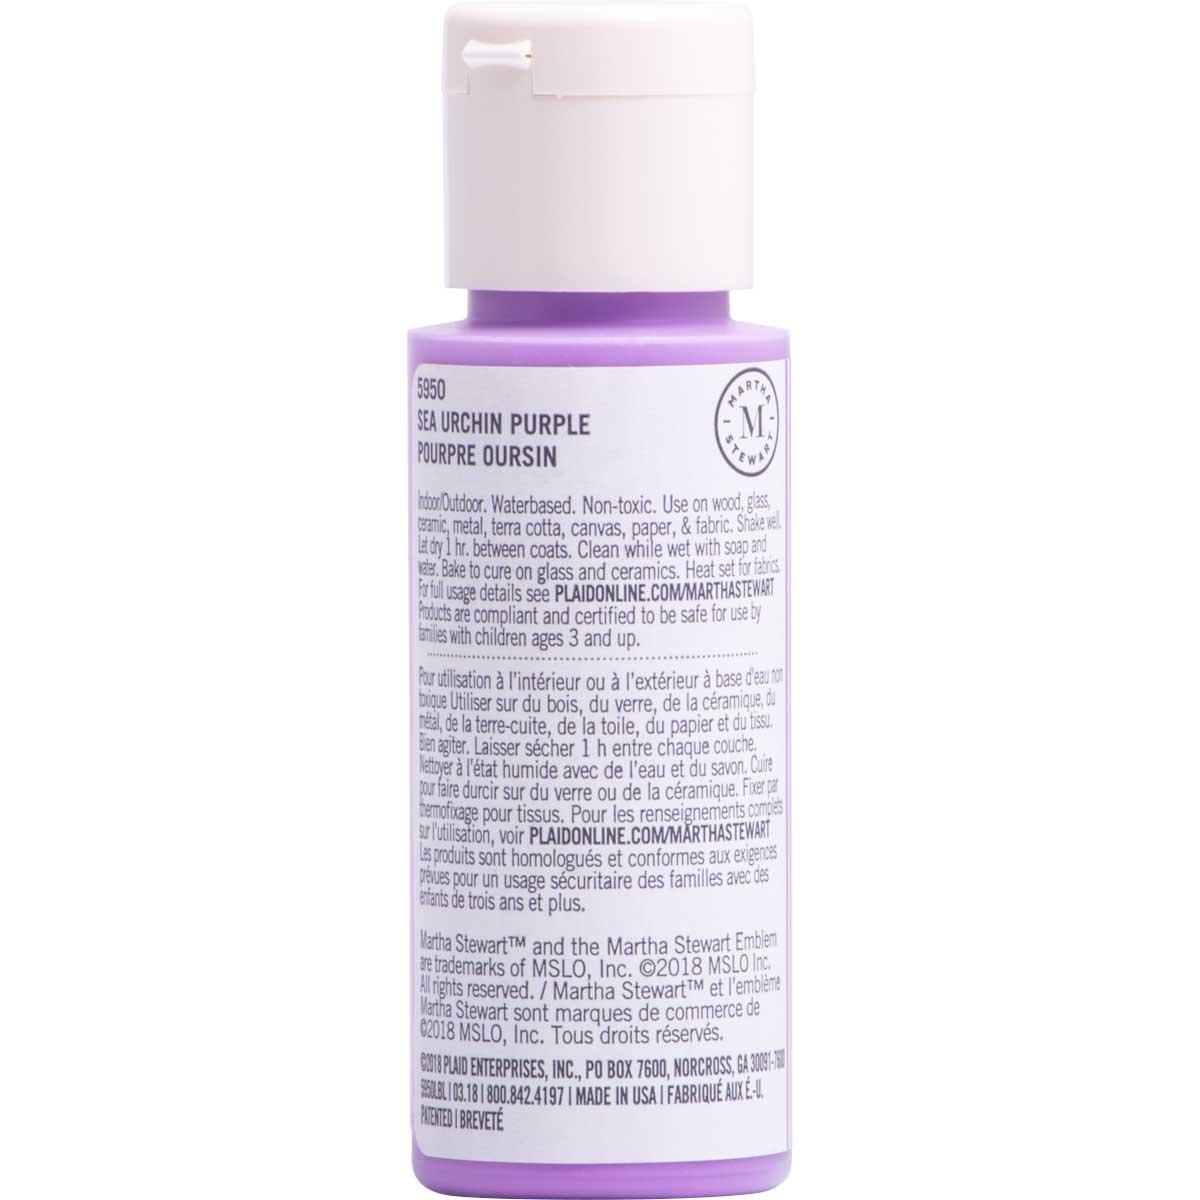 Martha Stewart ® Multi-Surface Satin Acrylic Craft Paint CPSIA - Sea Urchin Purple, 2 oz. - 5950